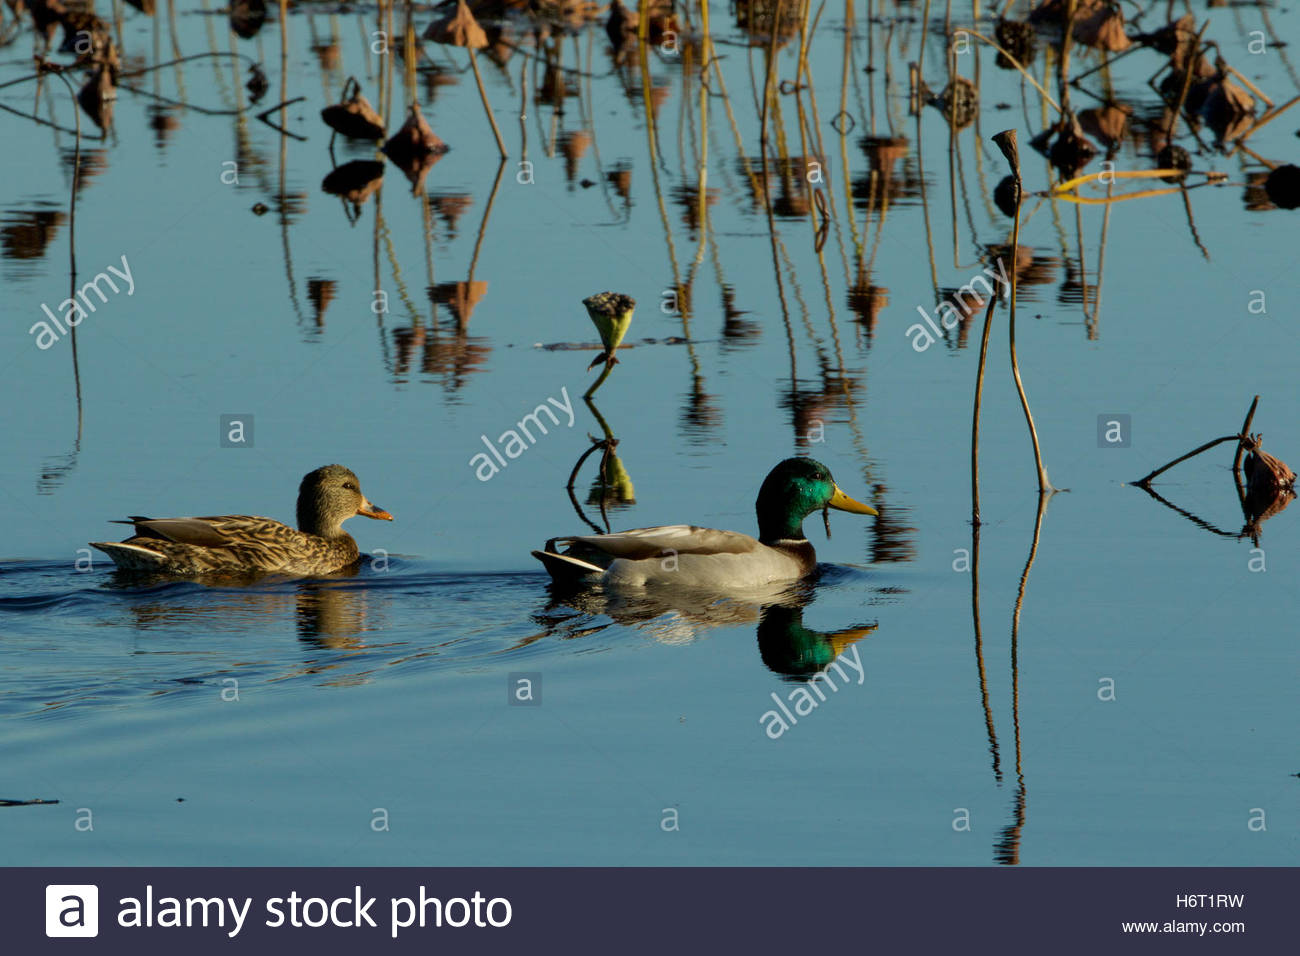 Mallard ducks, a male and female pair, swim on the water. - Stock Image